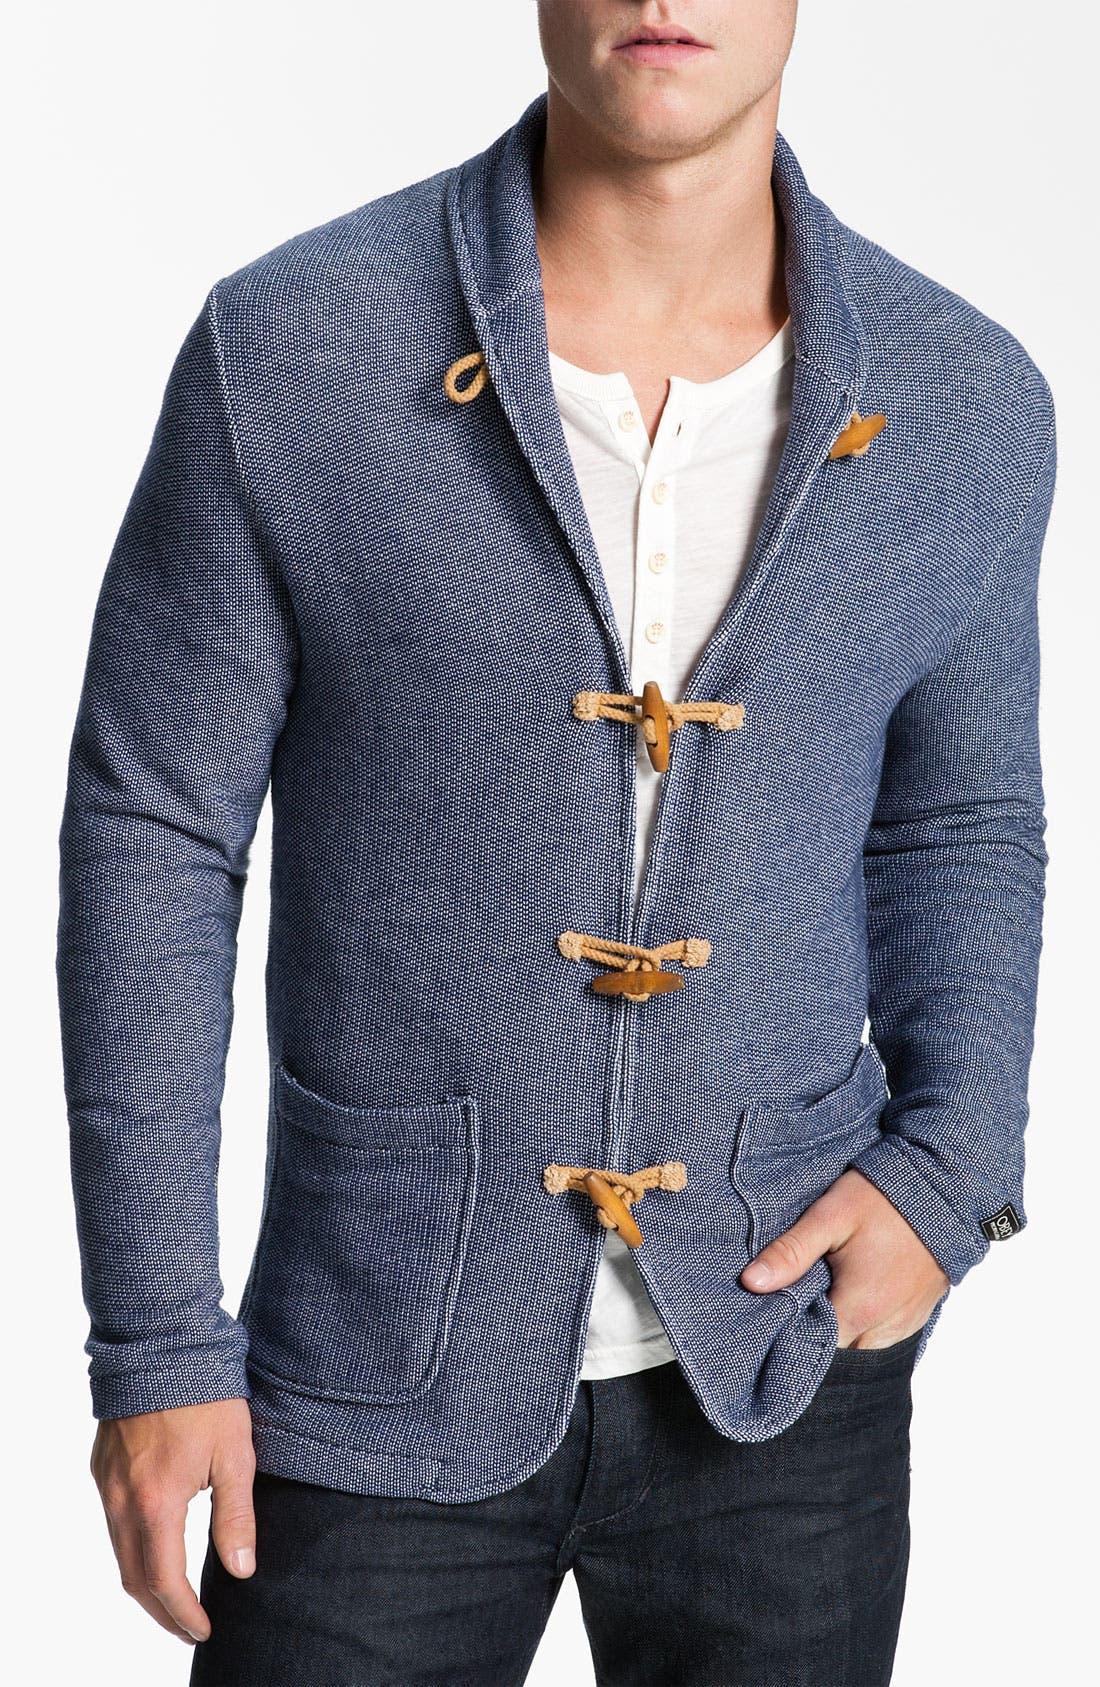 Alternate Image 1 Selected - Obey 'Tracks' Shawl Collar Cardigan